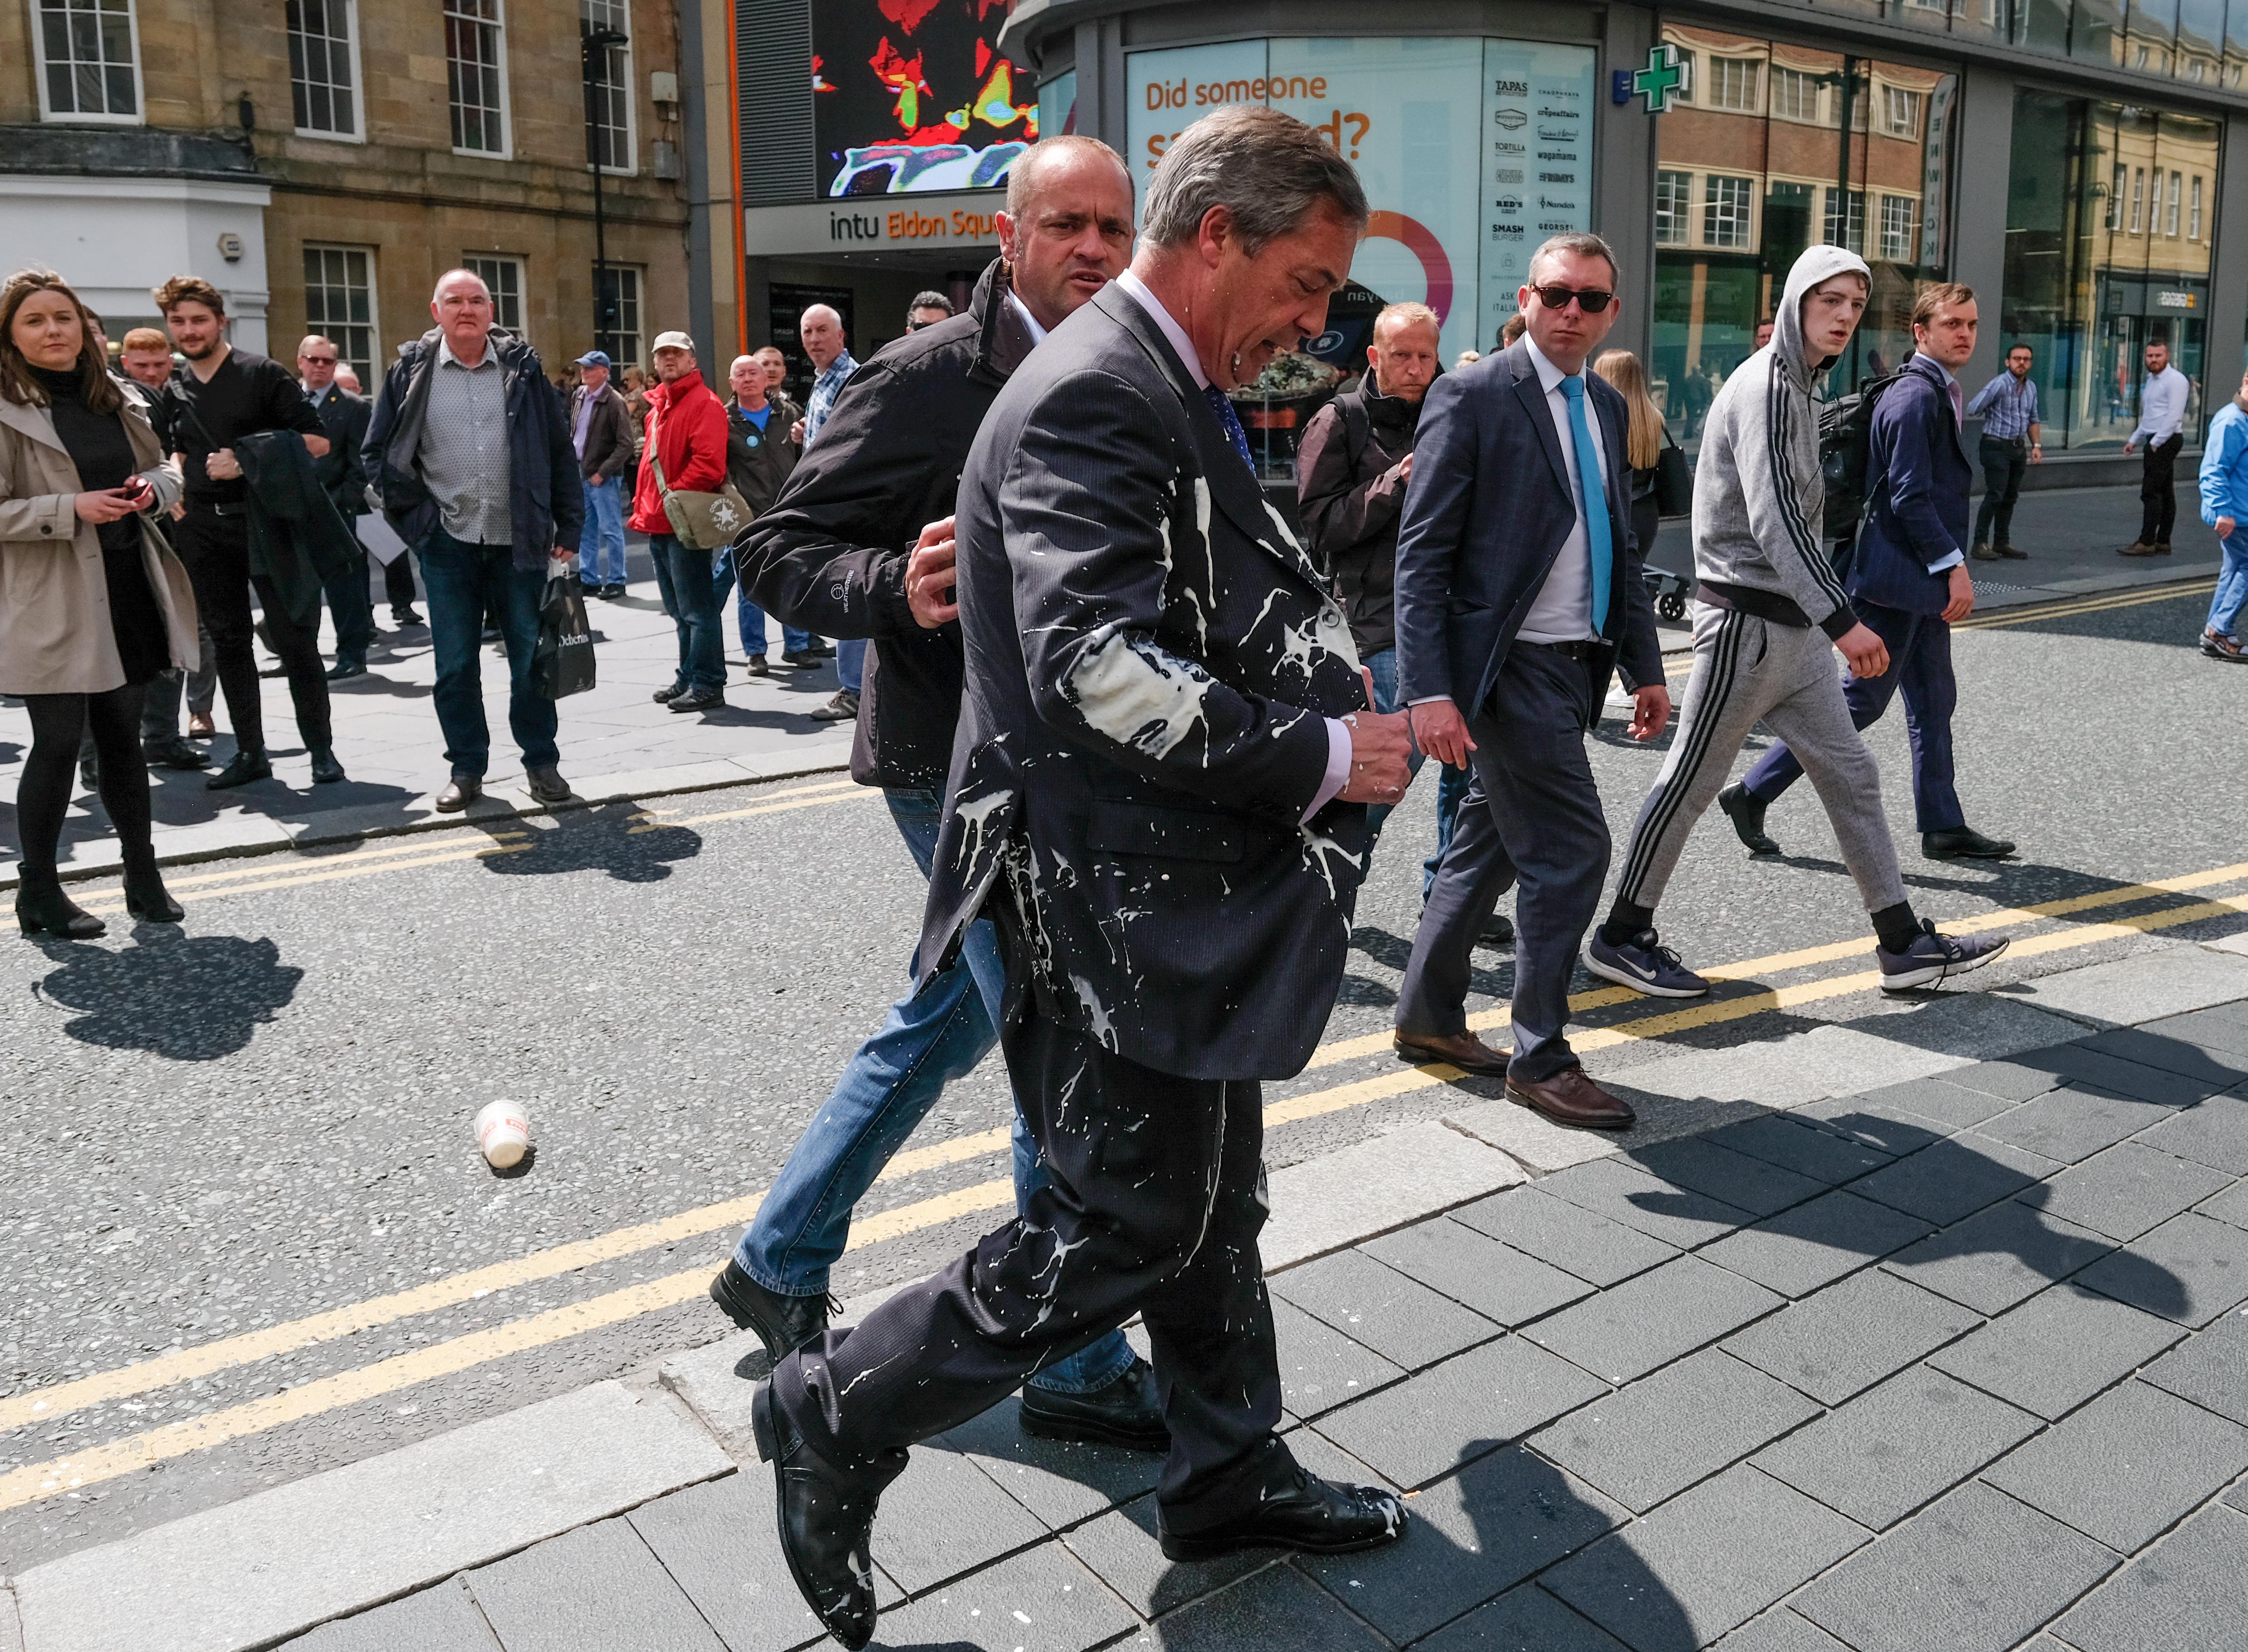 Nigel Farage splattered by milkshake